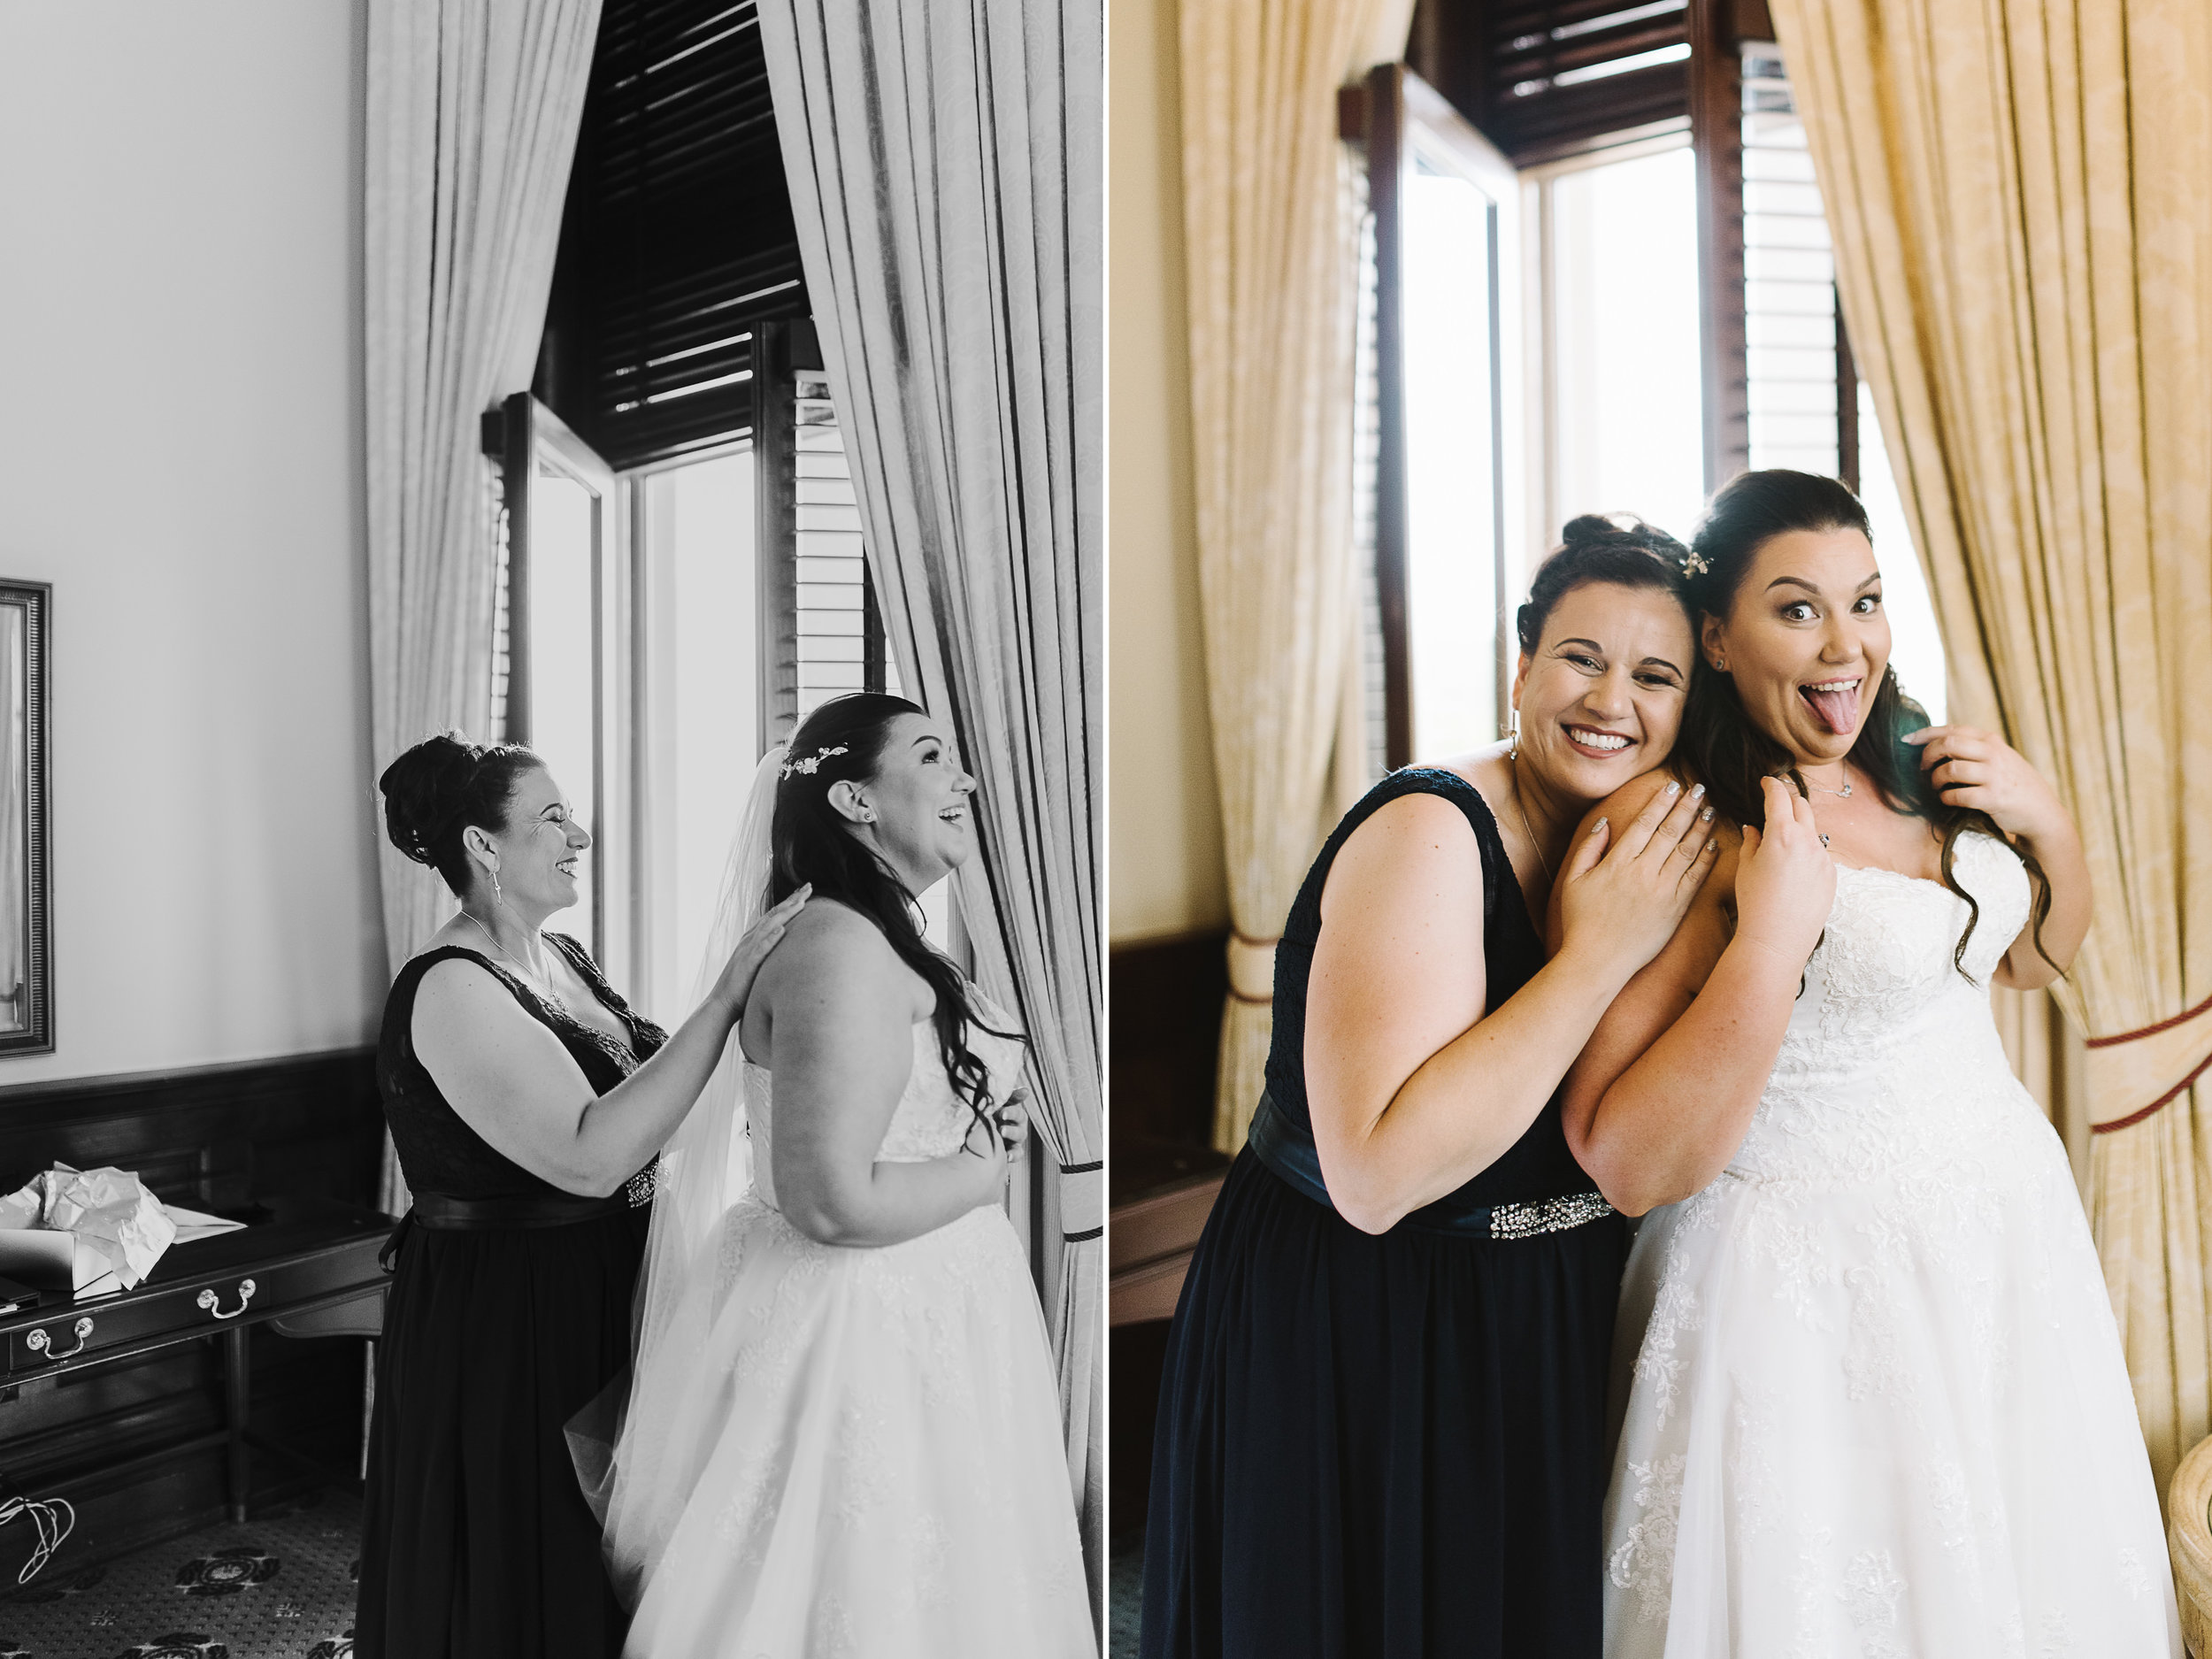 nudgee-college-wedding-9.jpg